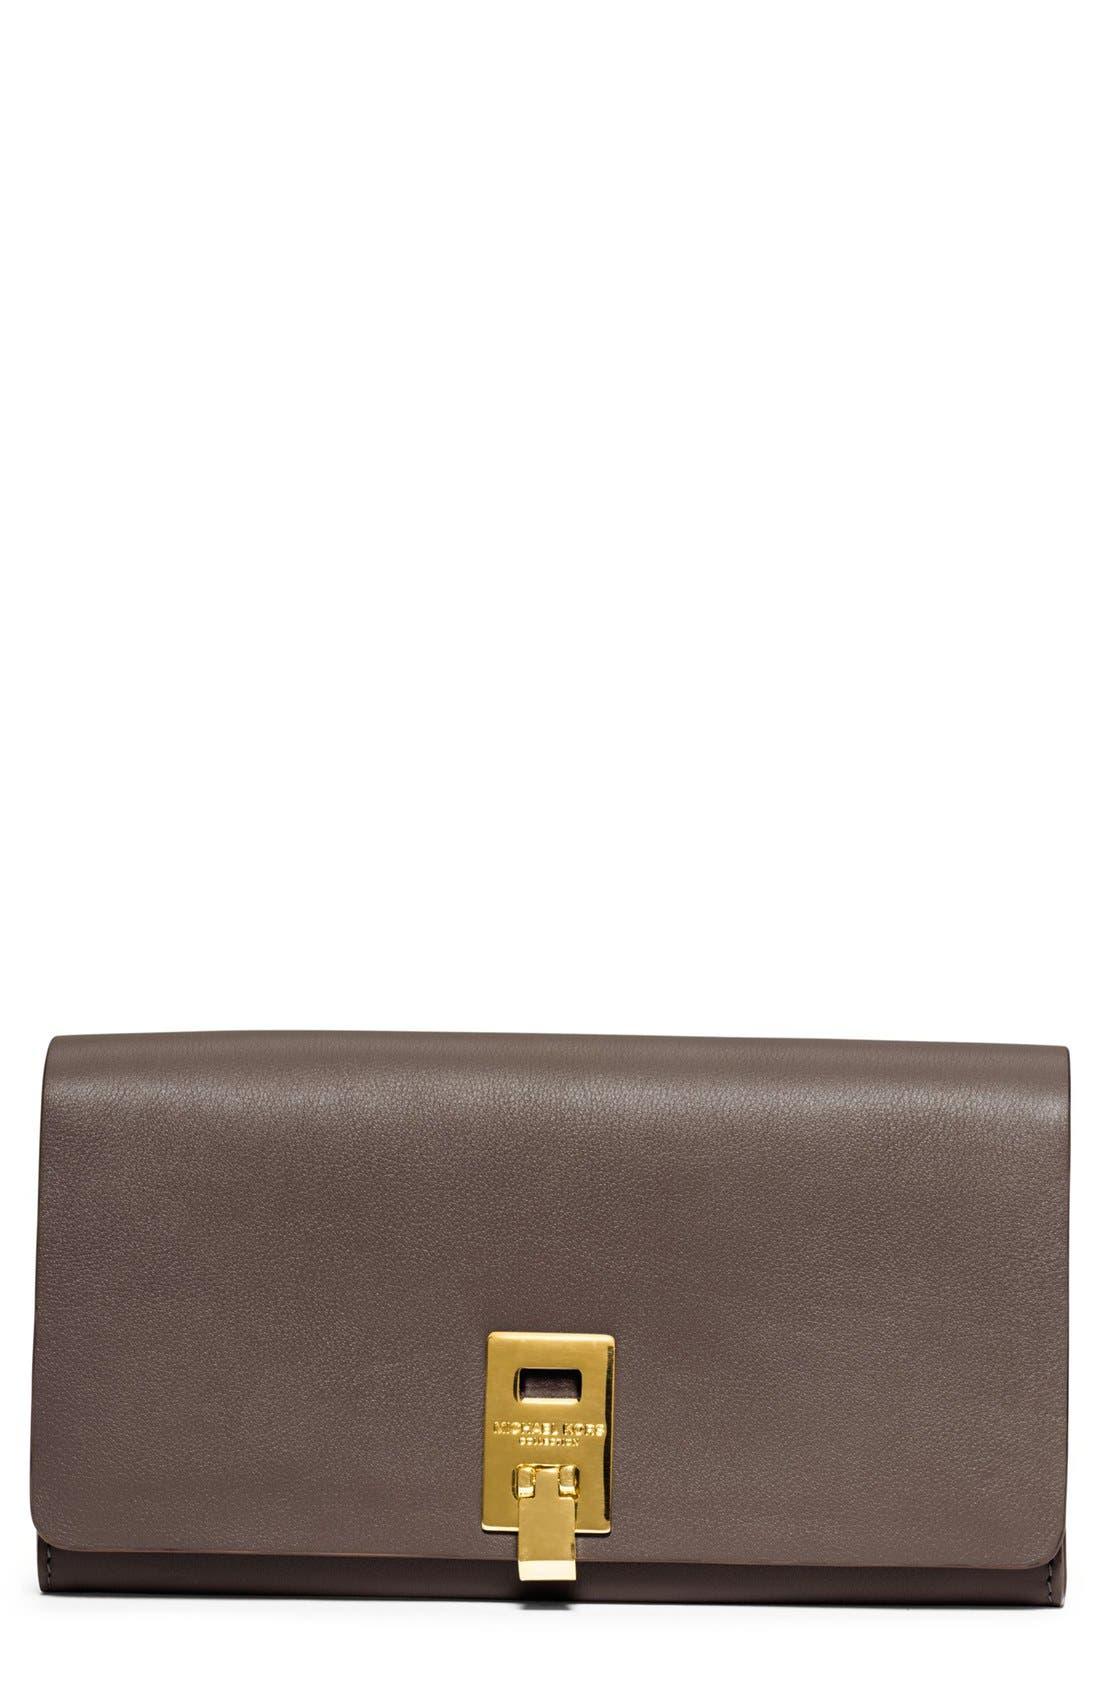 Main Image - Michael Kors 'Miranda' Leather Continental Wallet